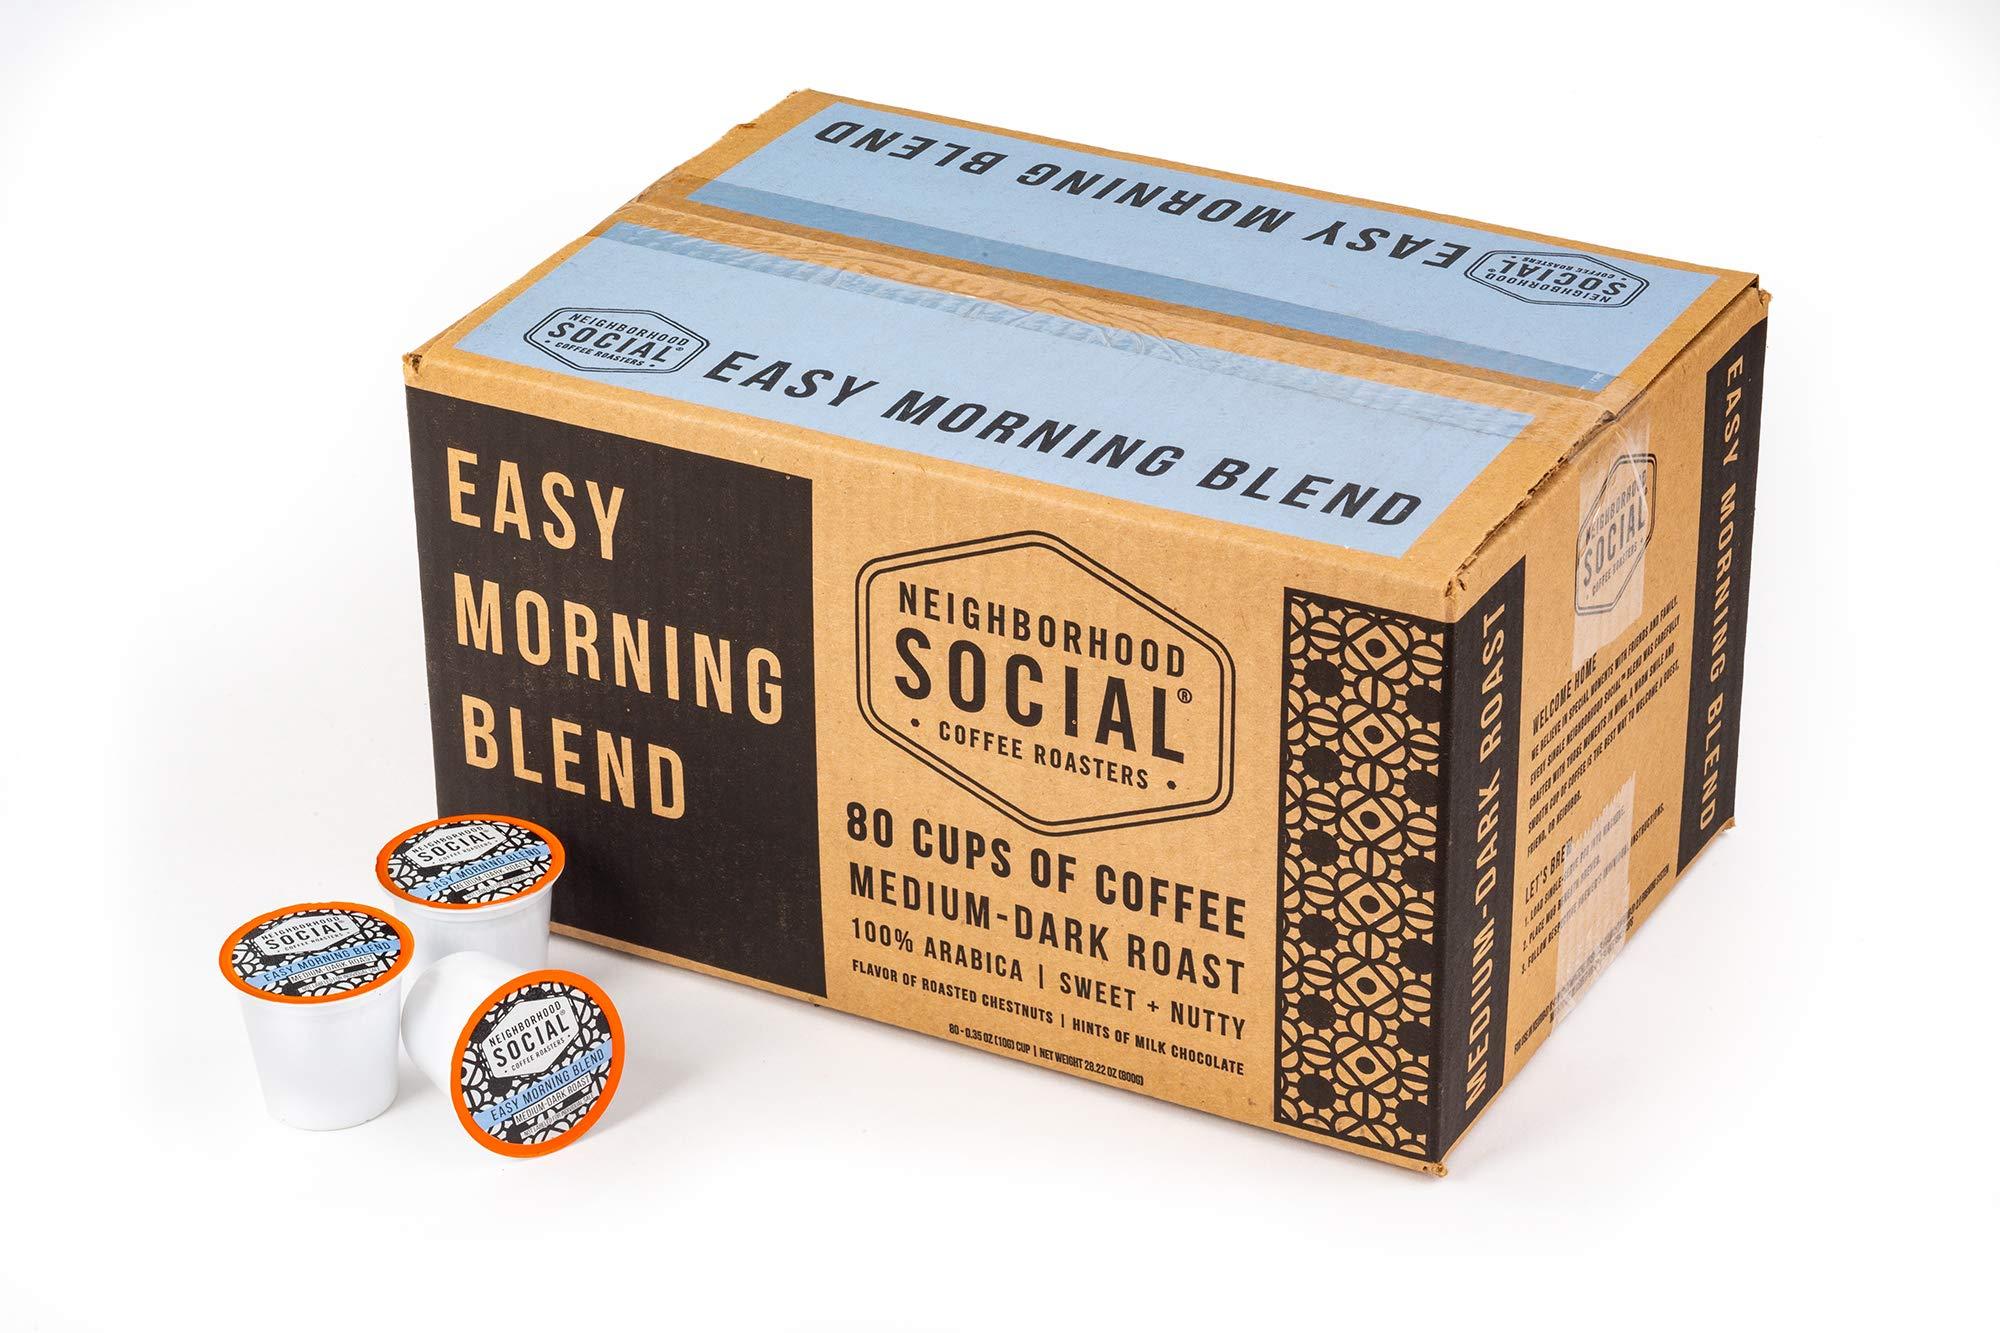 Neighborhood Social, Easy Morning Blend Medium Dark Roast Gourmet Coffee, 80 count Single Serve Cups by Neighborhood Social